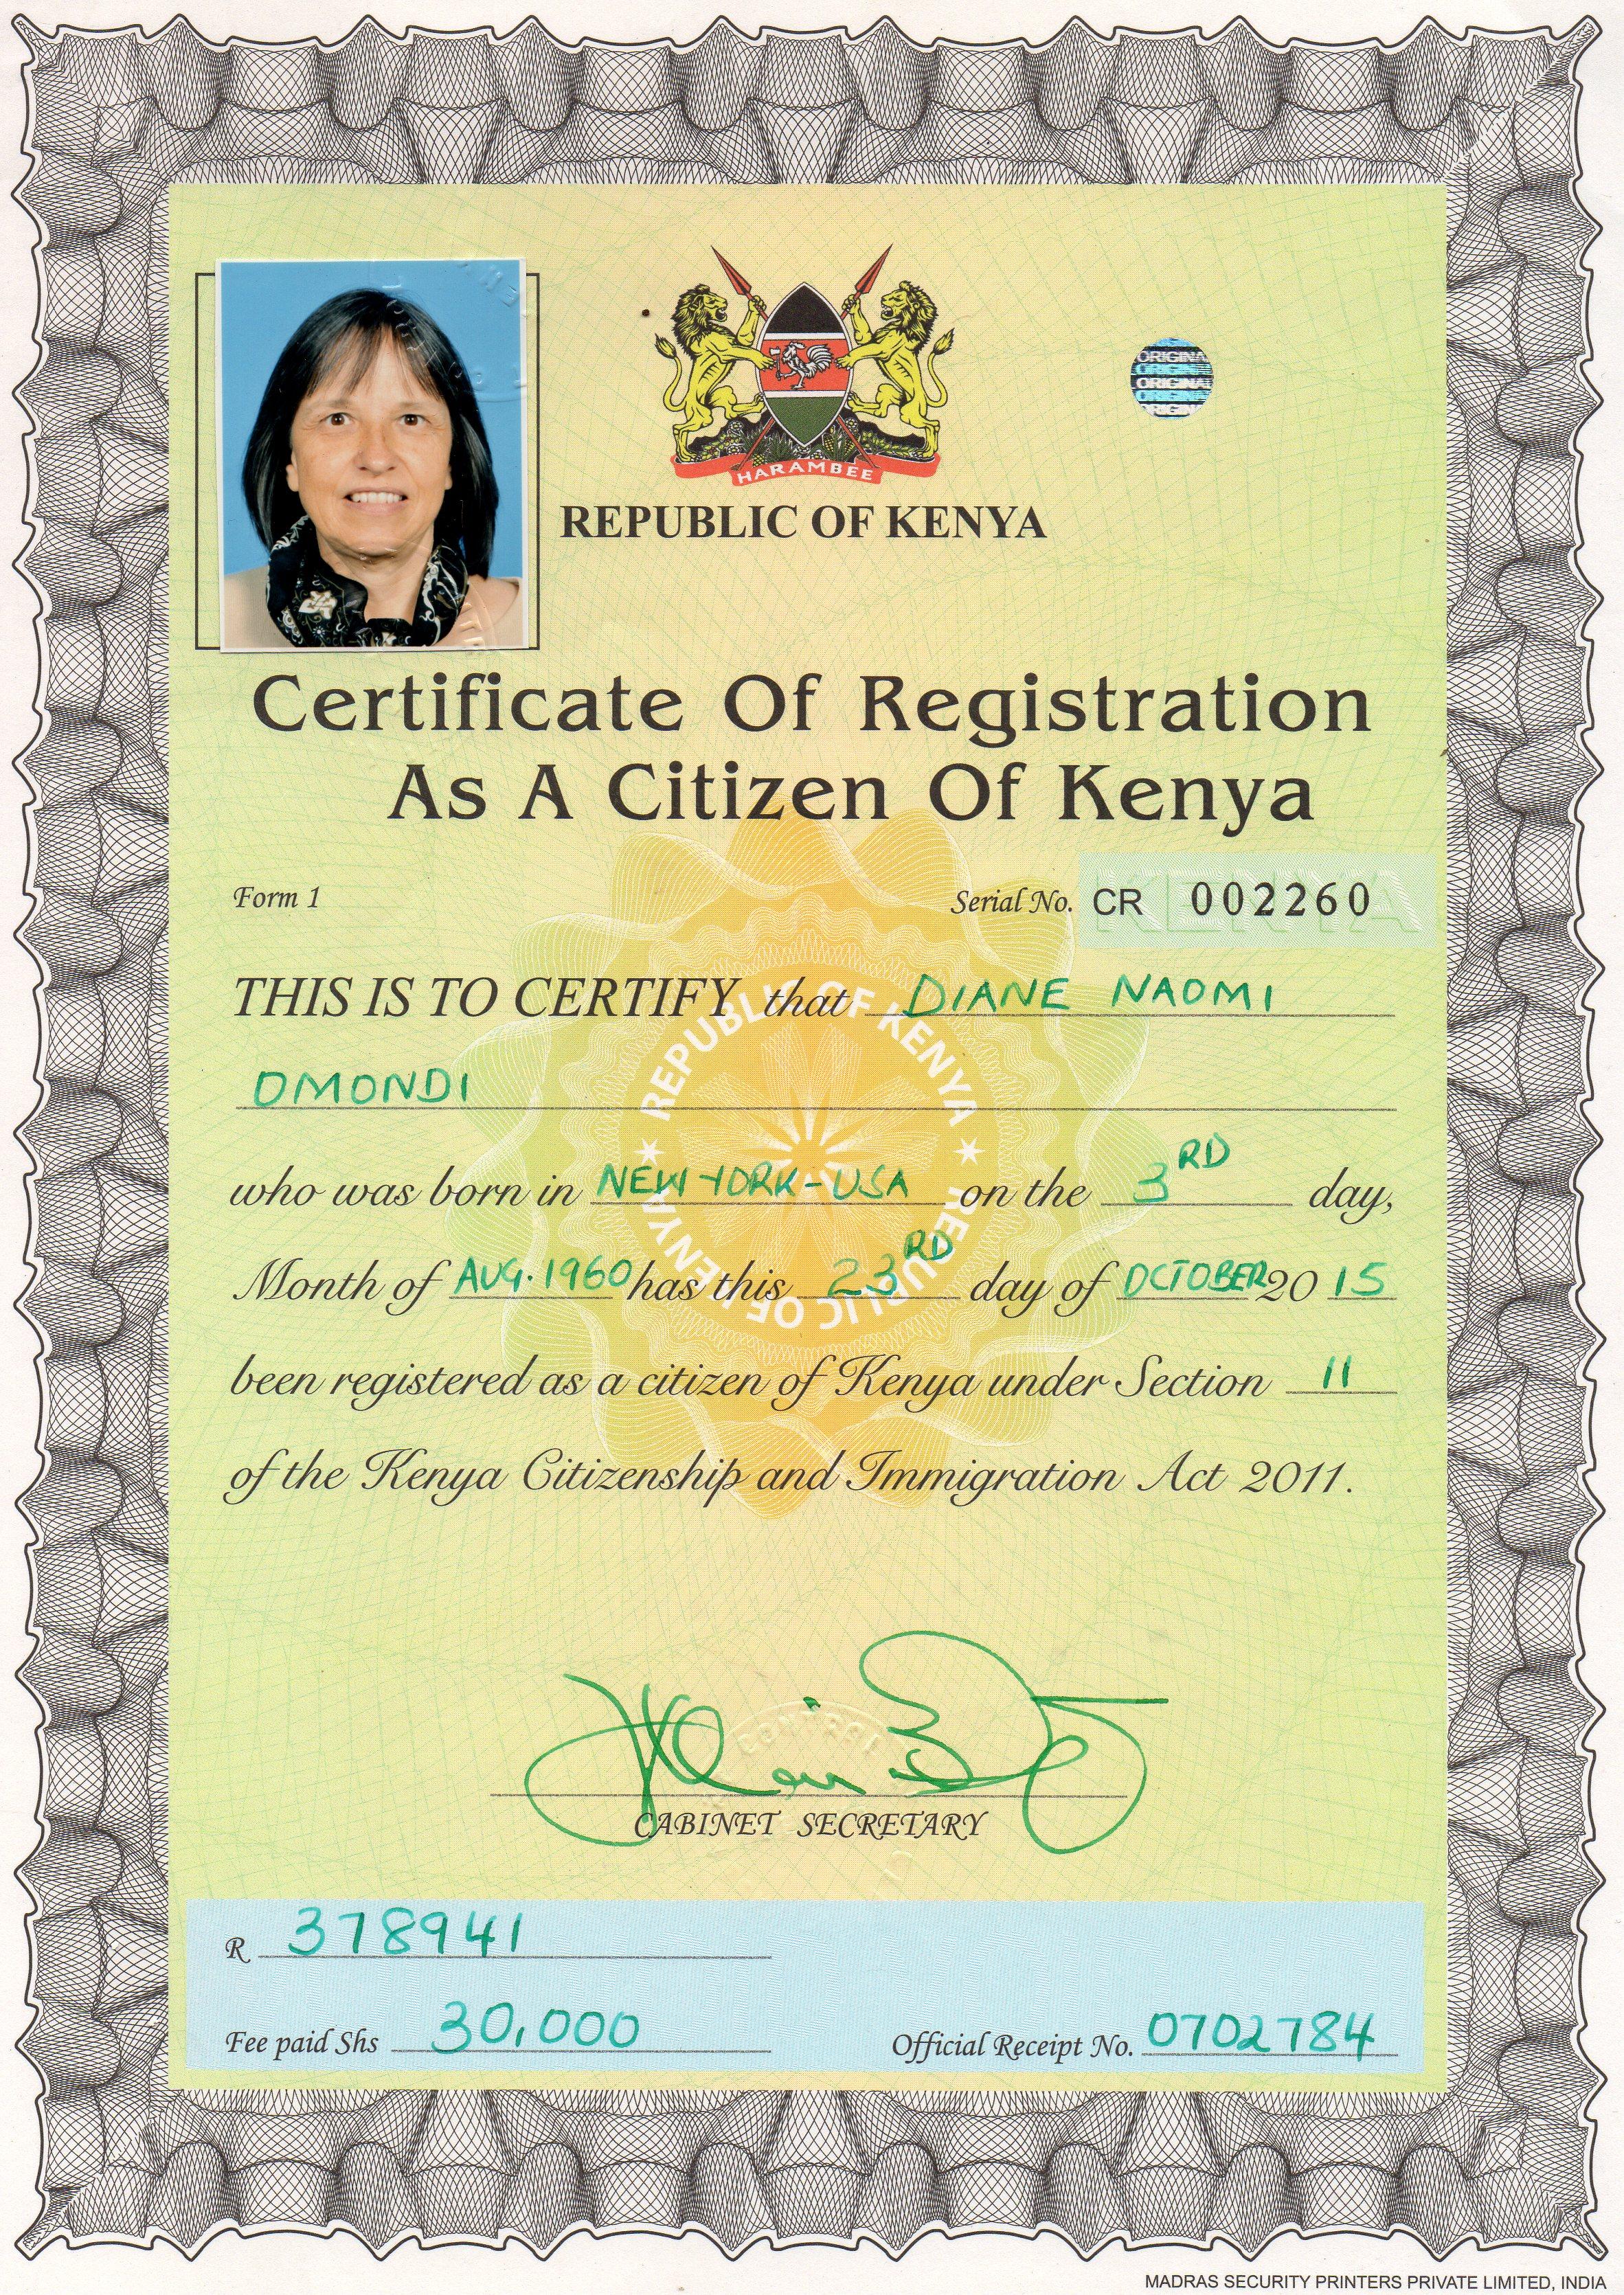 Dual Citizen Omondis In Kenya